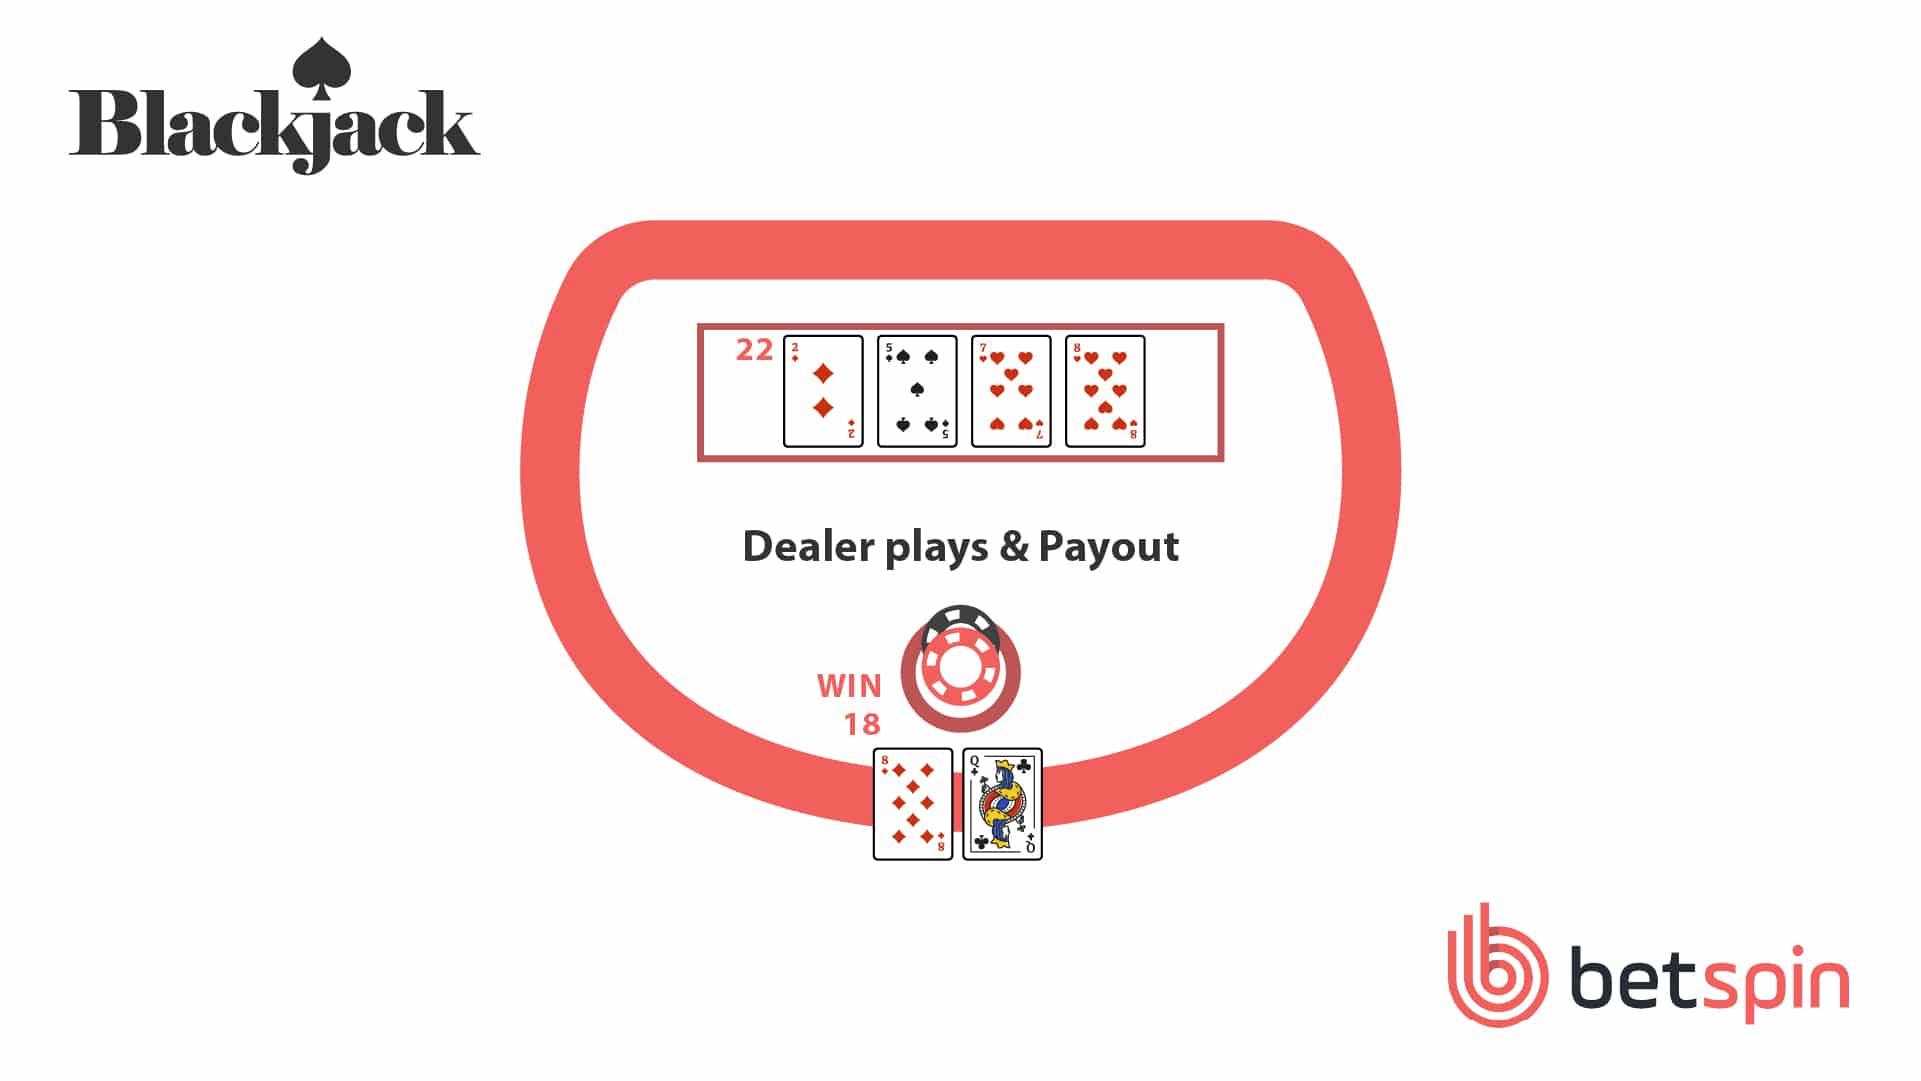 Blackjack Step 3